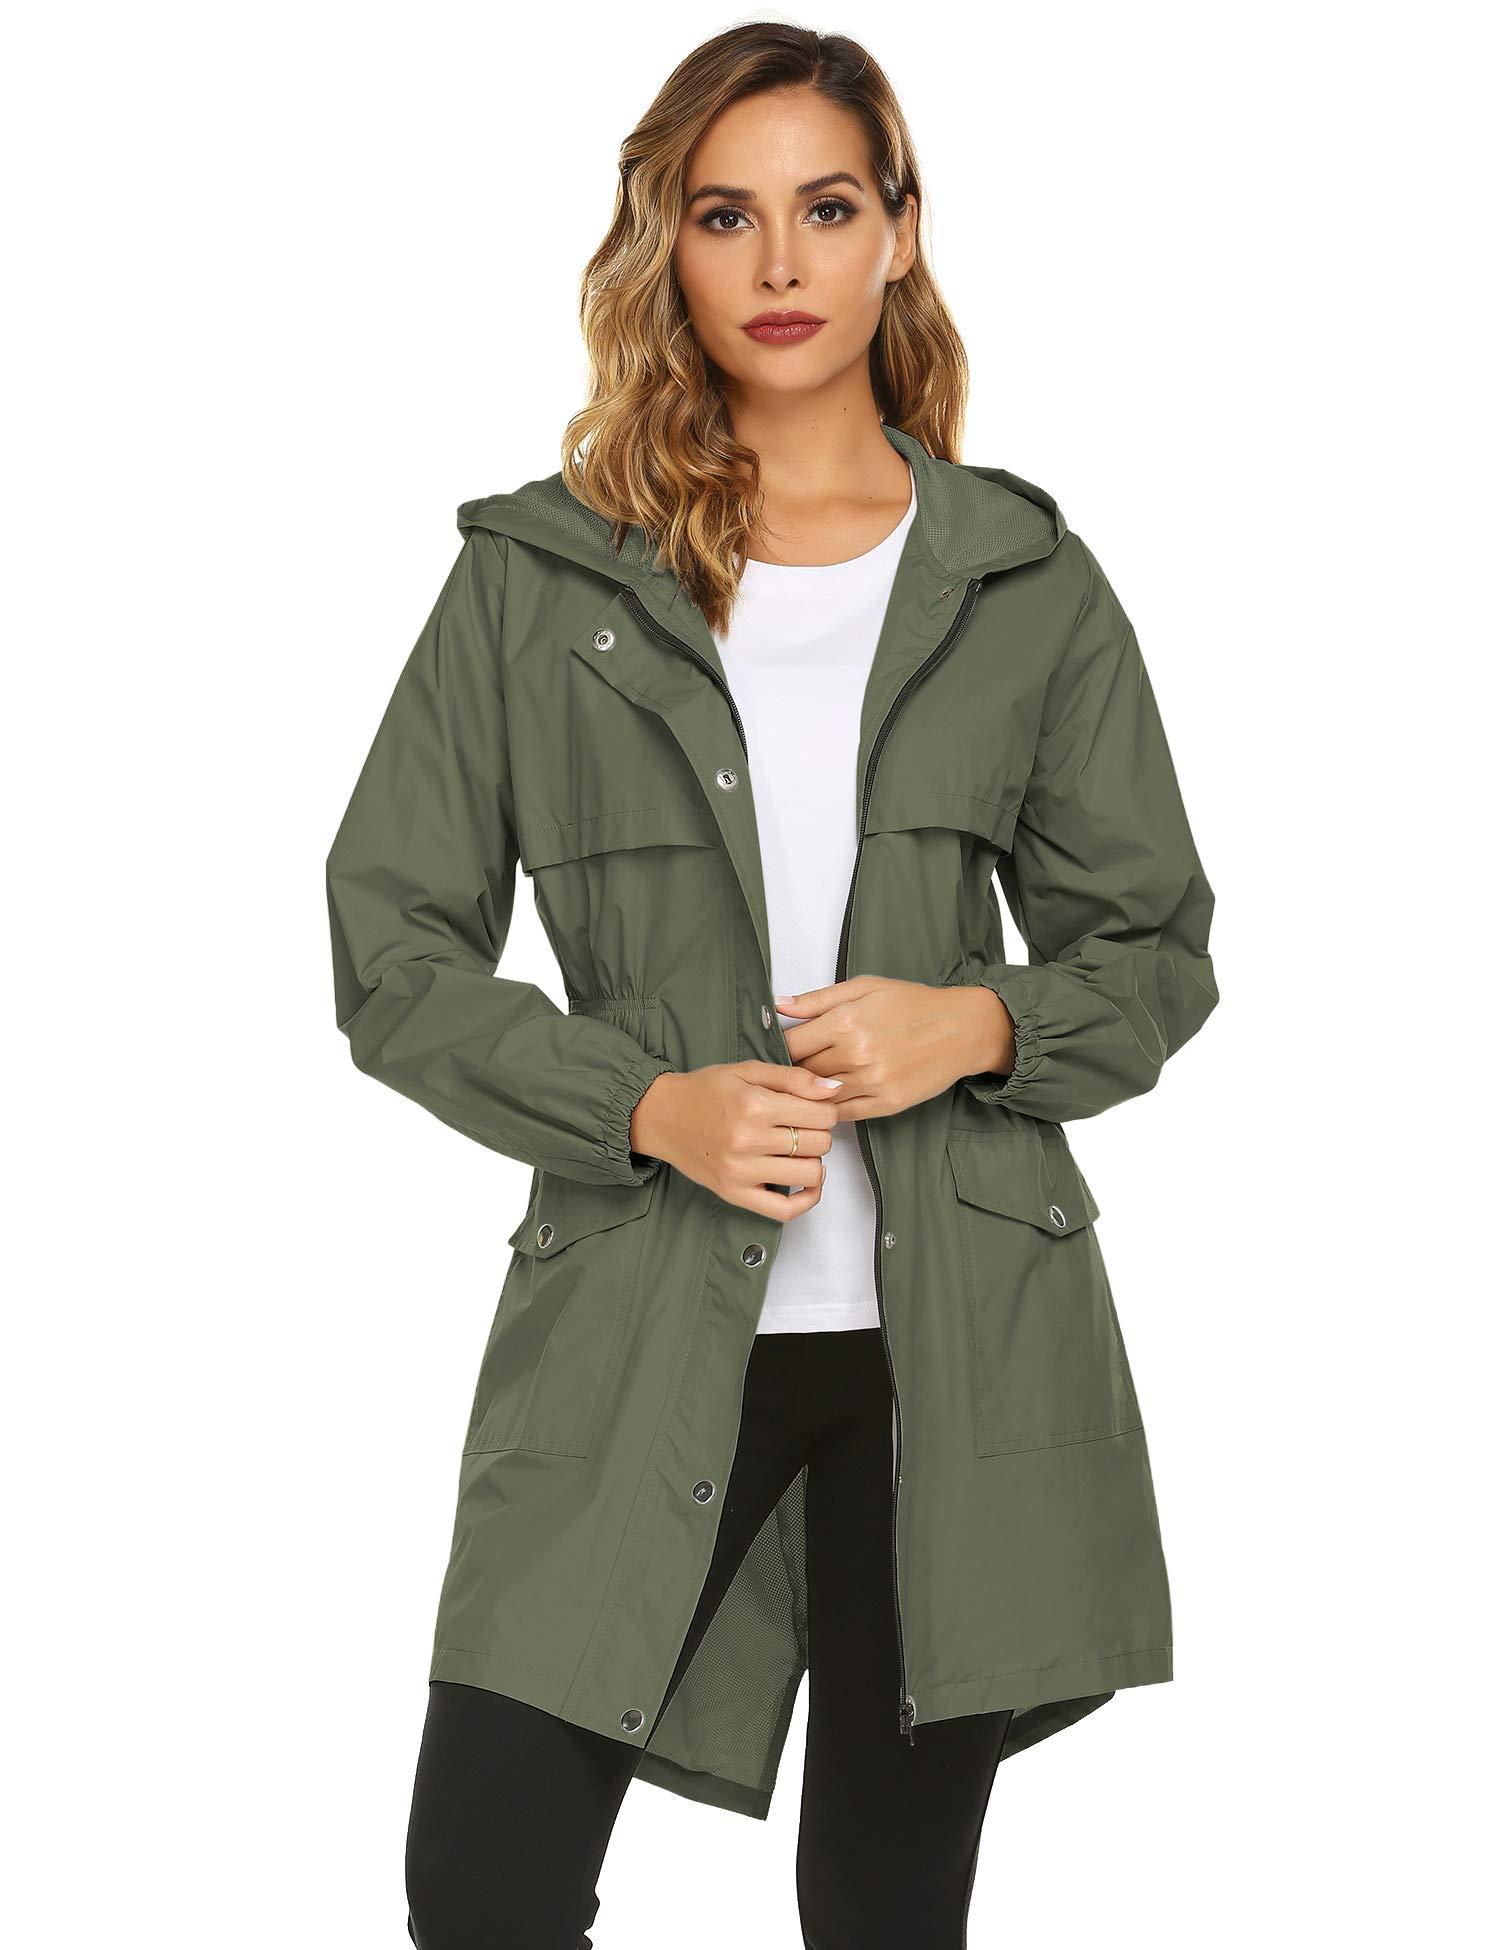 Avoogue Mesh Lining Packable Rain Jacket Women